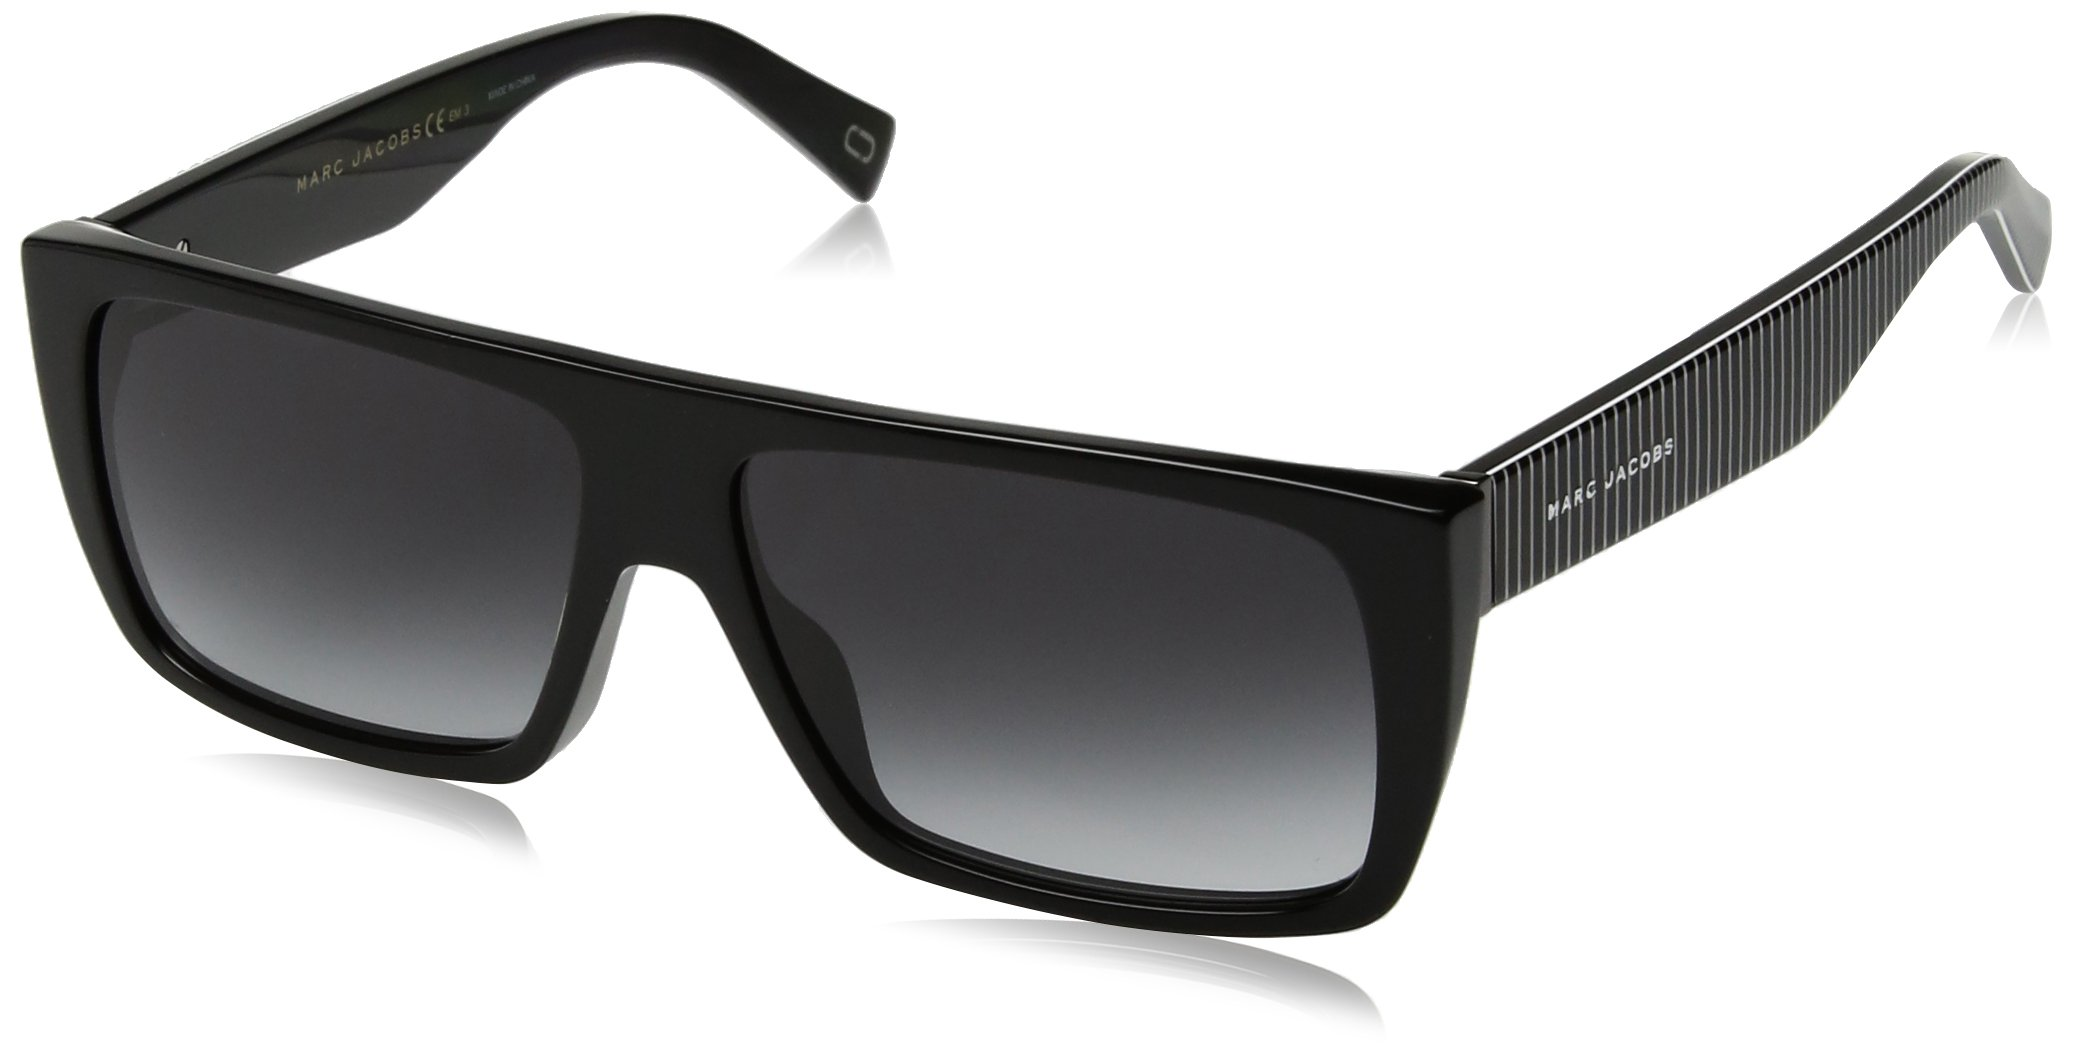 Marc Jacobs Marc096s Rectangular Sunglasses, Black, 57 mm